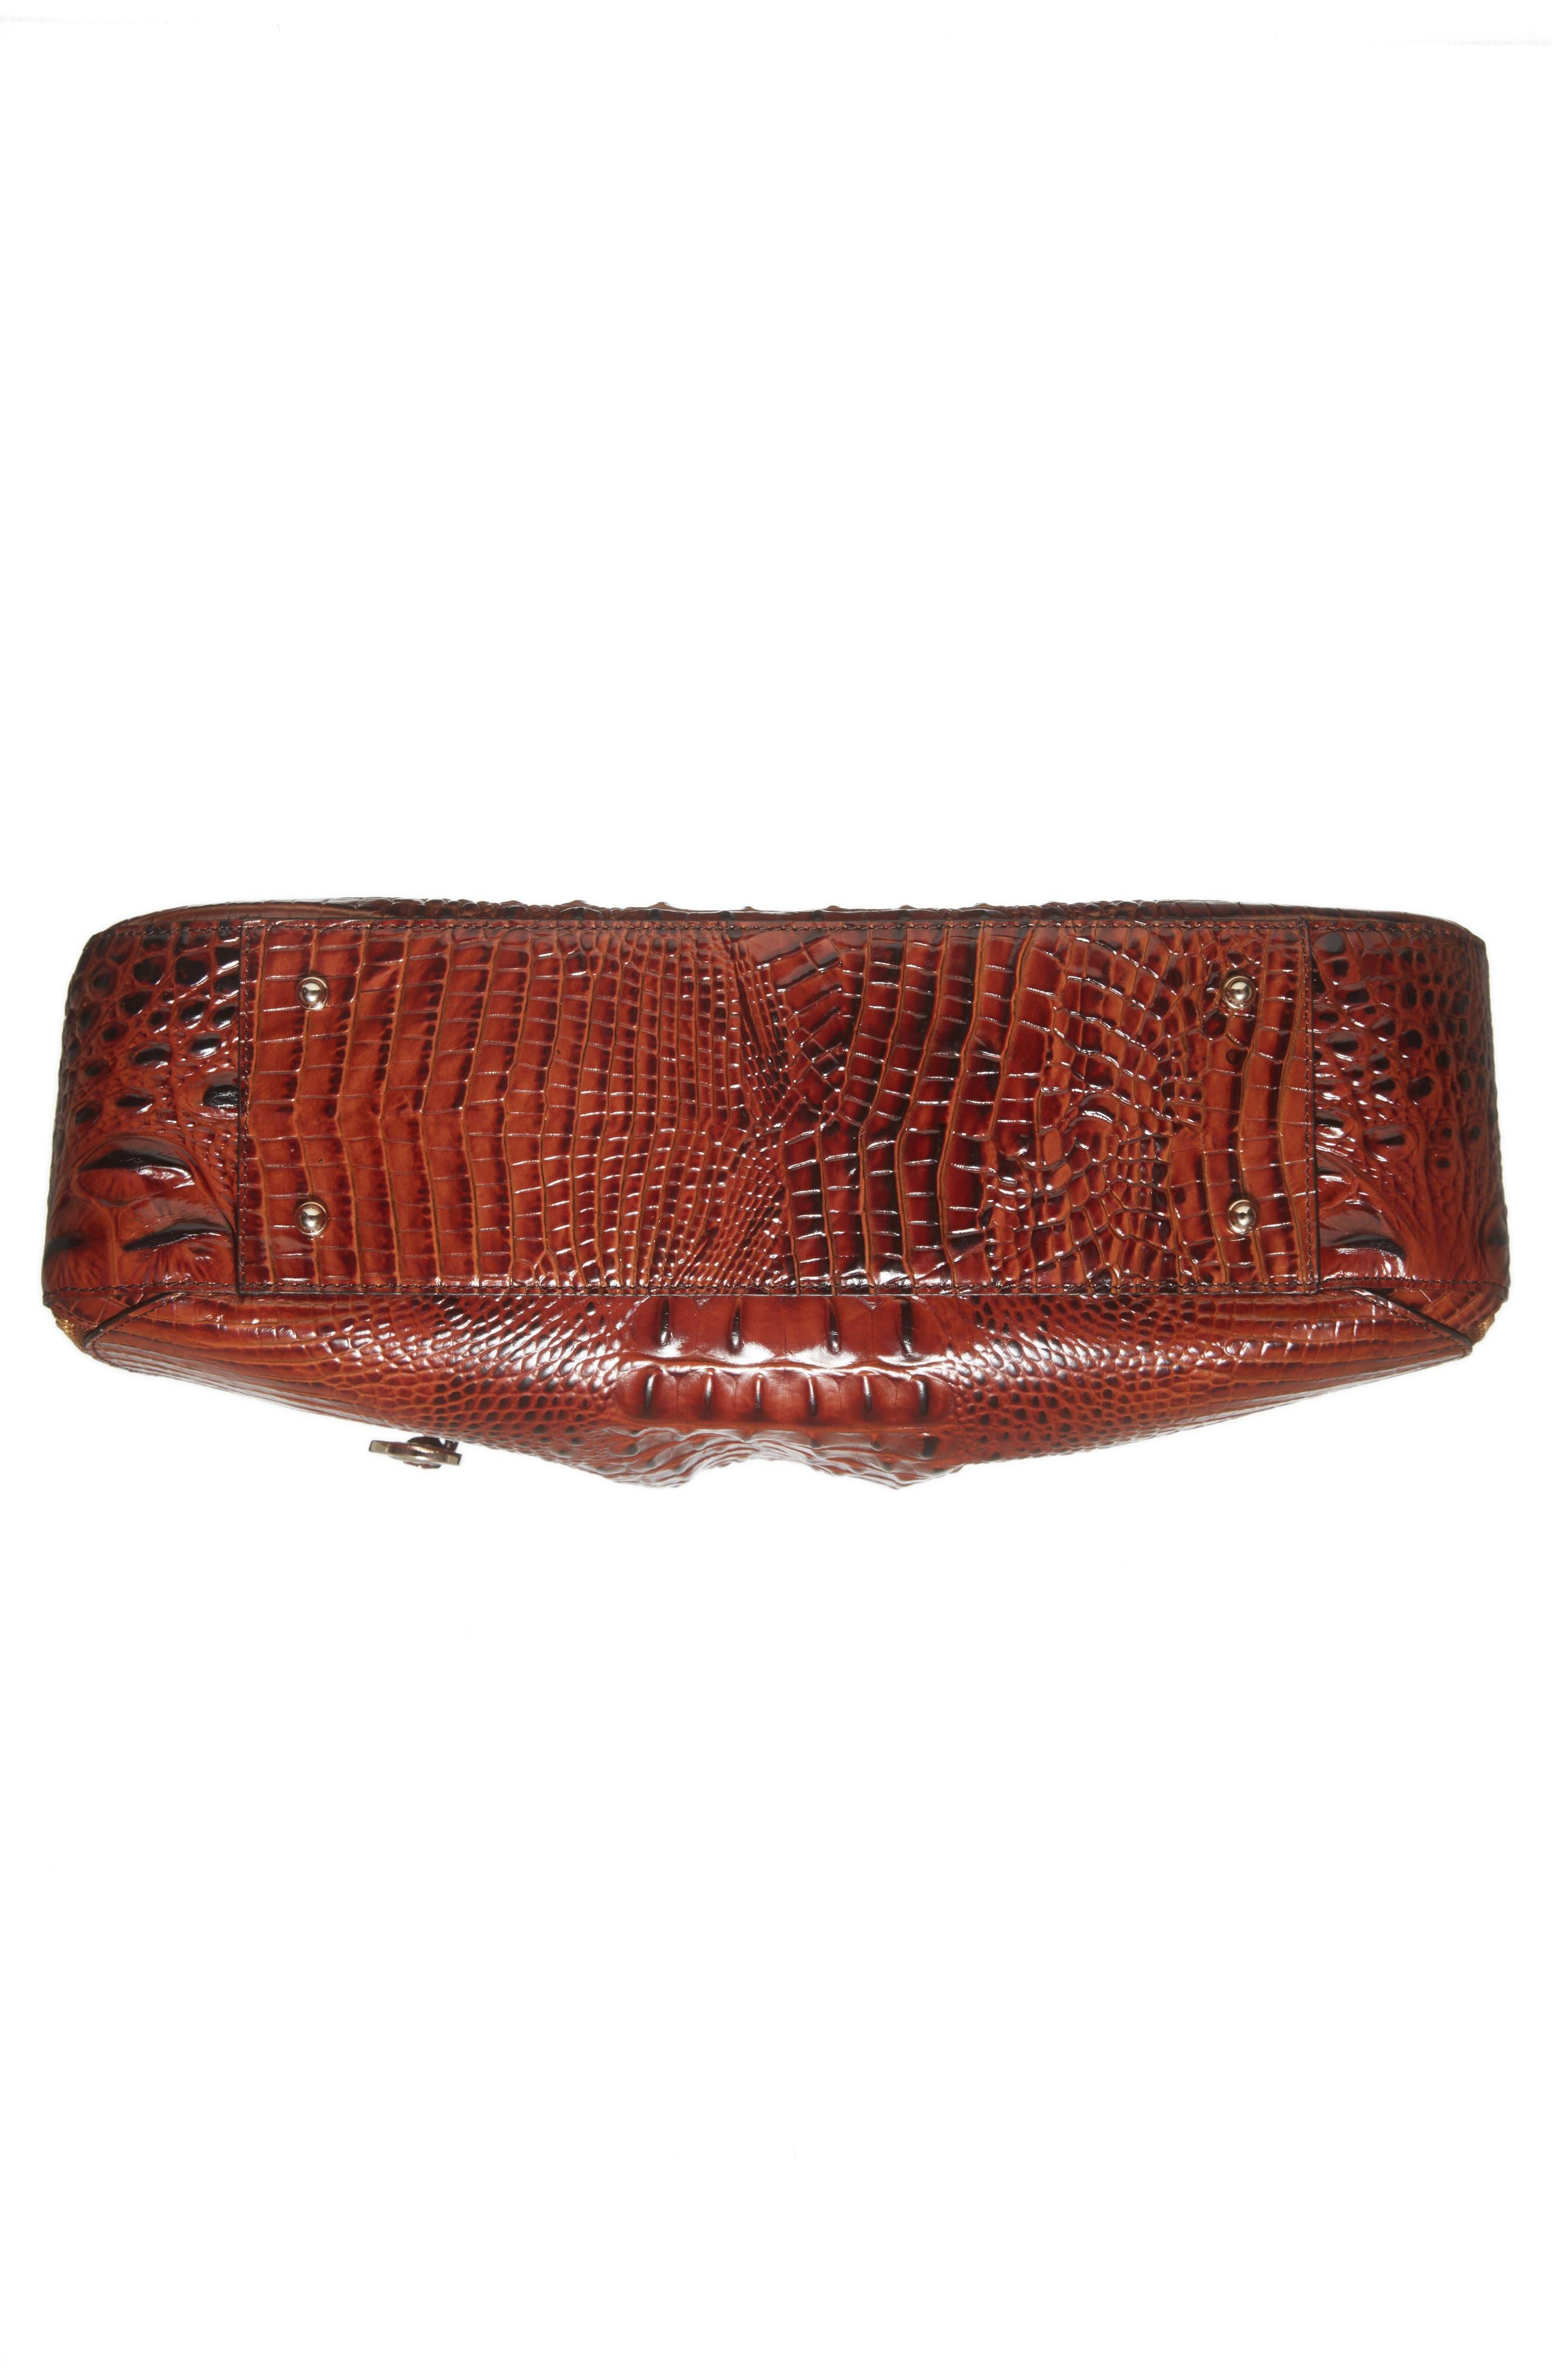 BRAHMIN, Melbourne - Adina Croc Embossed Leather Satchel, Alternate thumbnail 6, color, PECAN